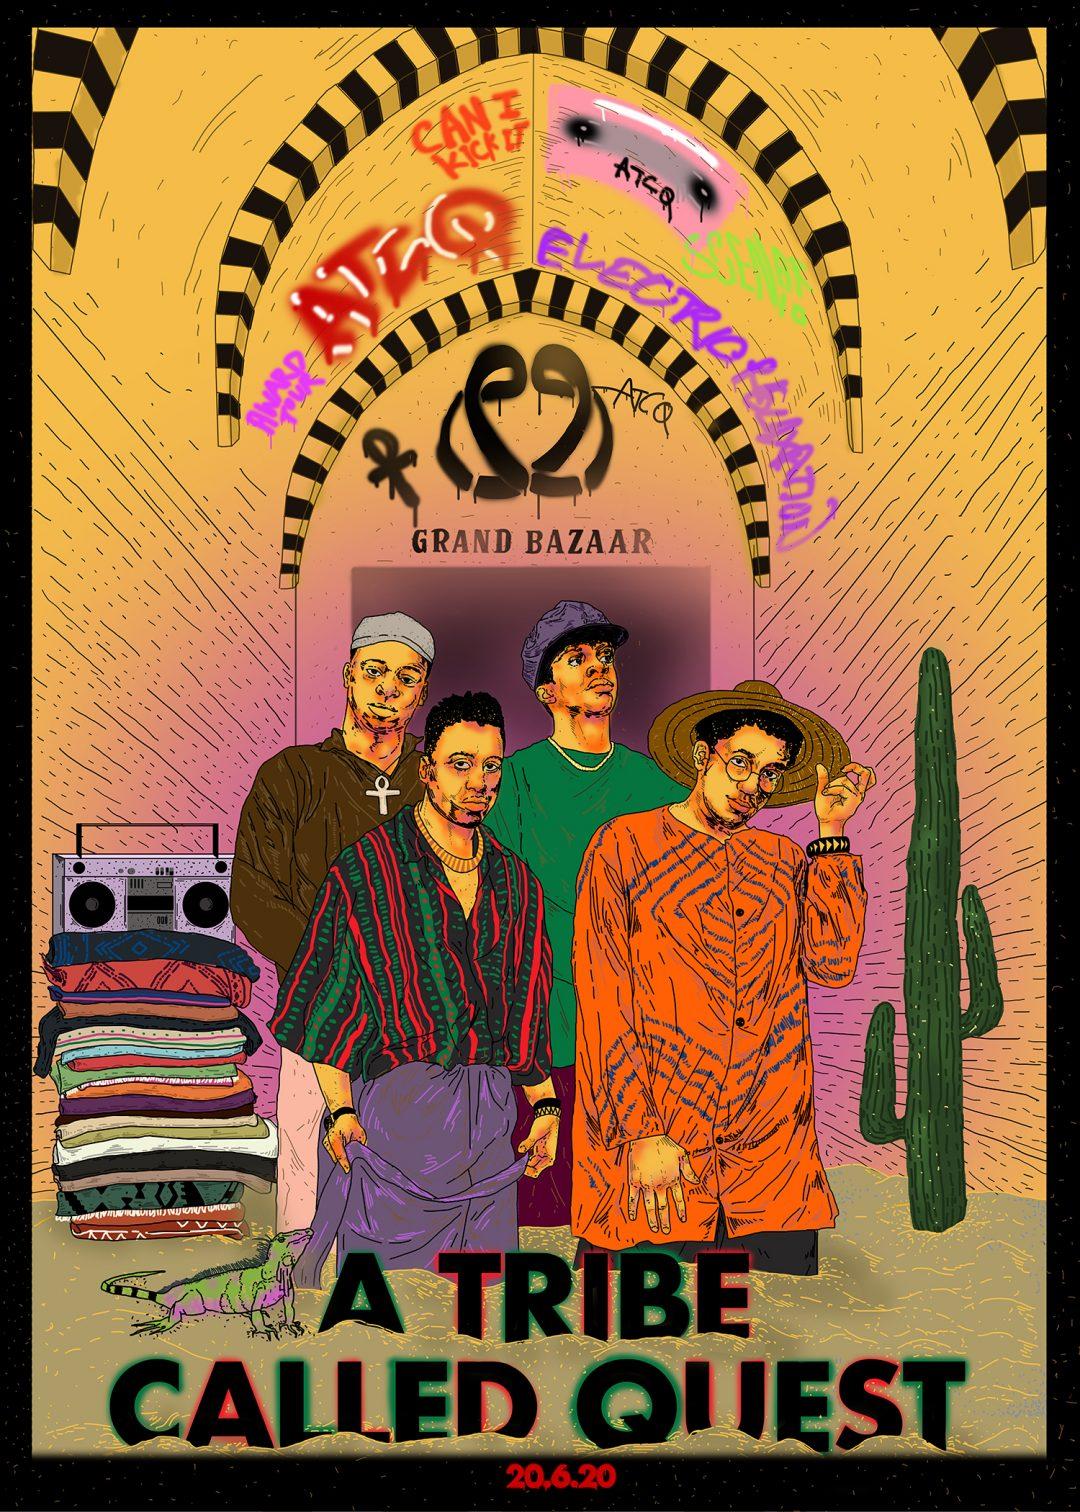 Dream Gigs Illustrated: Simay Bahçıvan - A Tribe Called Quest @ Kapalıçarşı